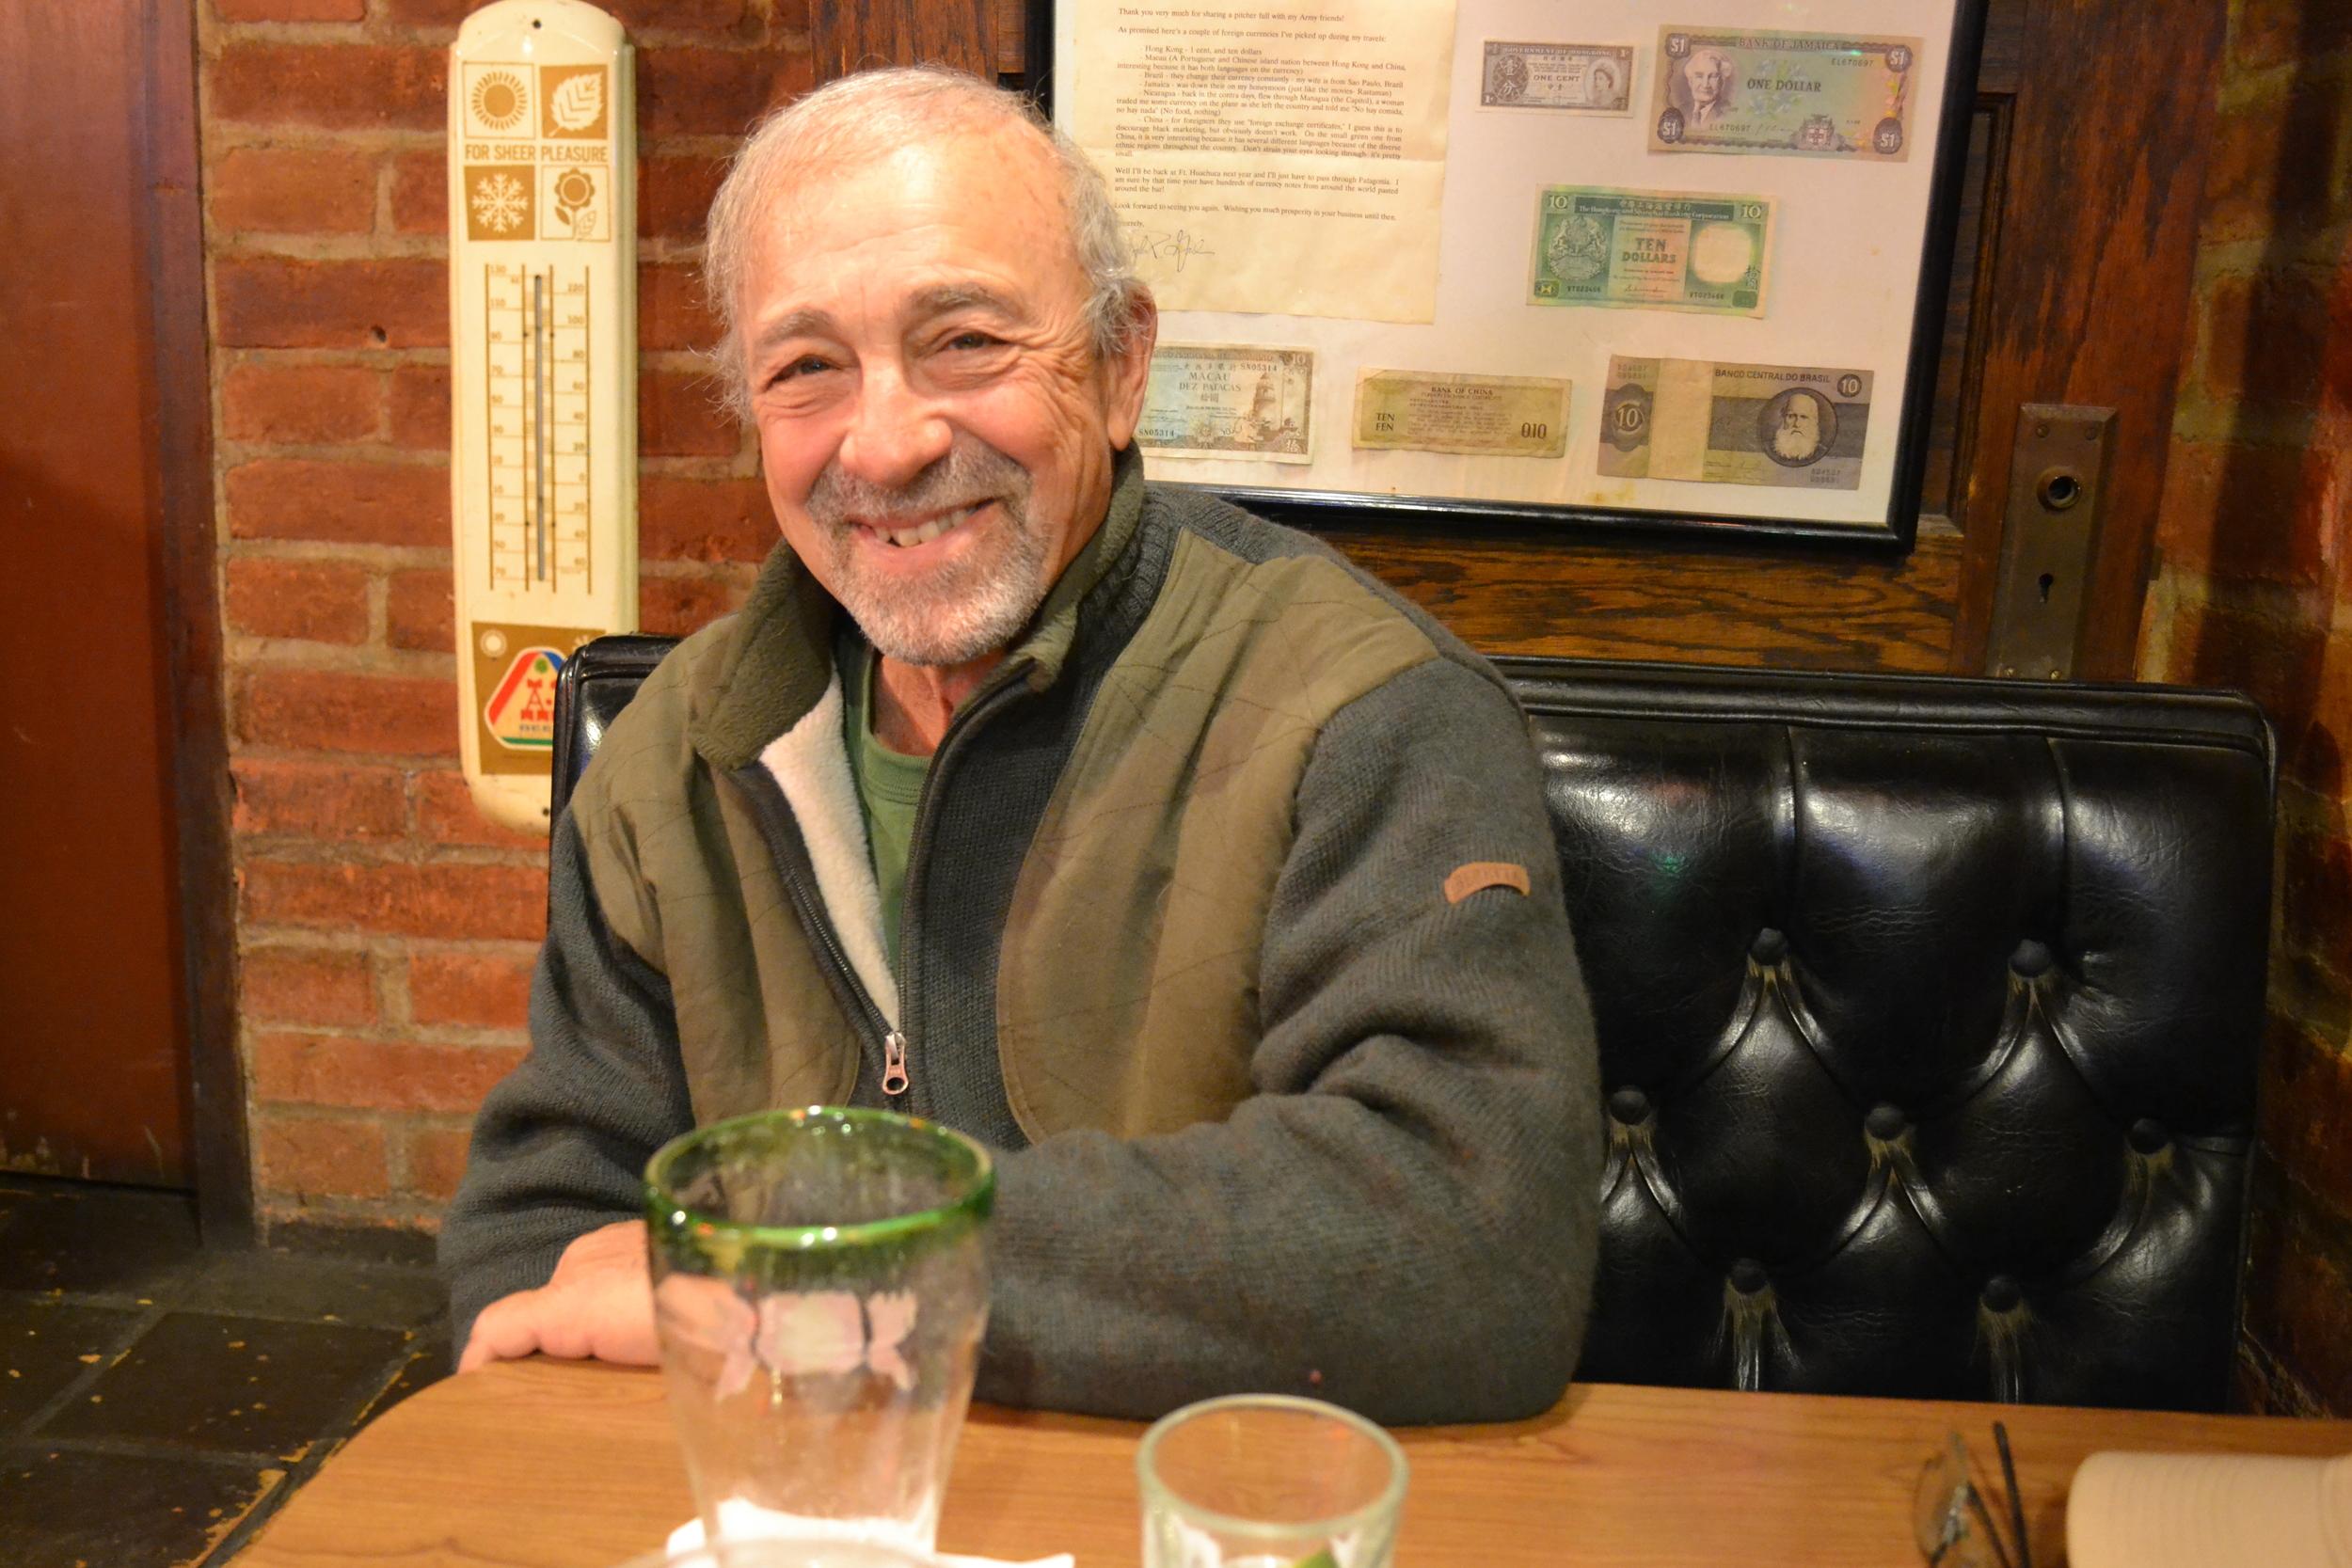 Author/journalist Philip Caputo at the Wagon Wheel Saloon.